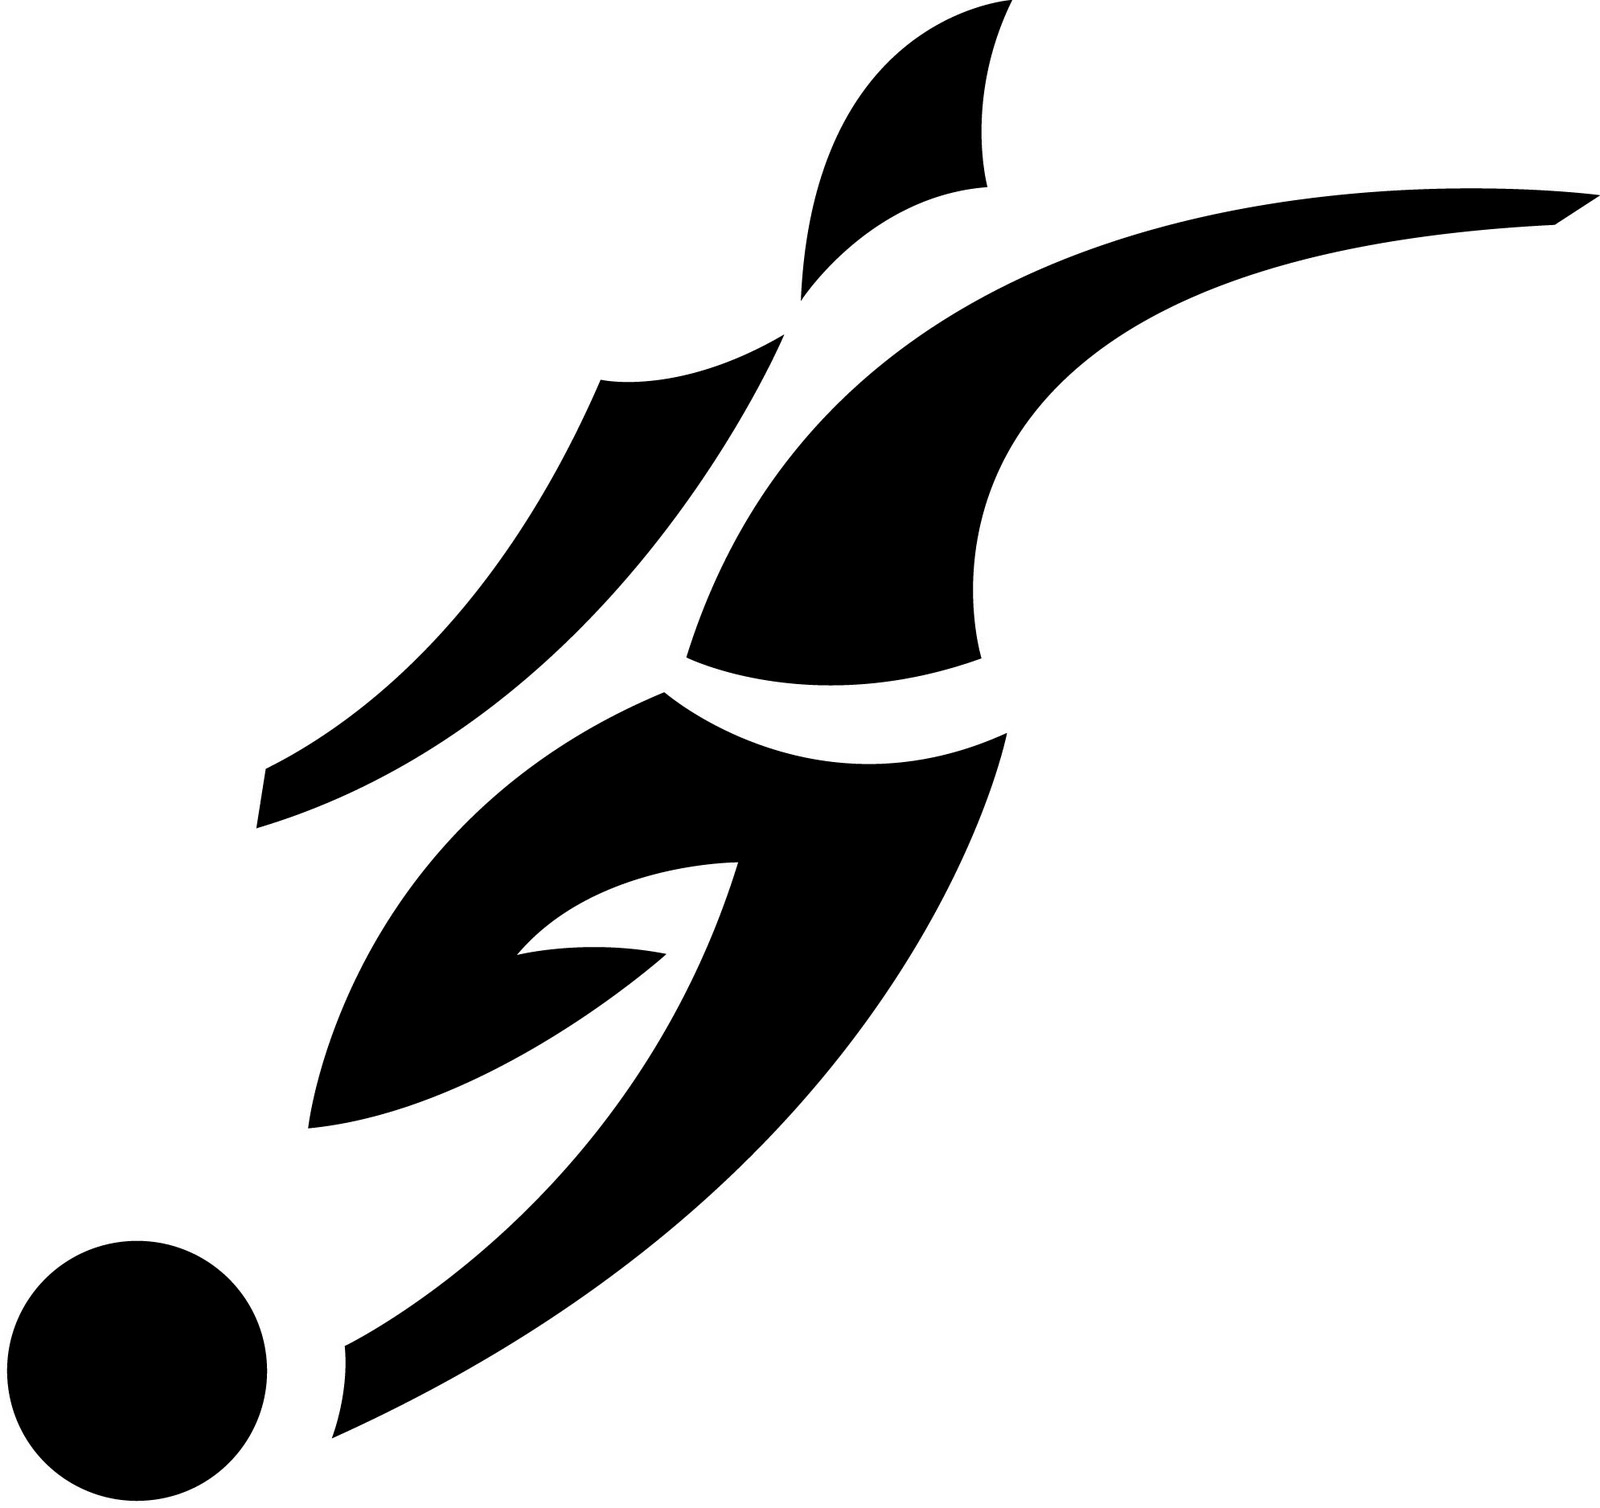 Персональний логотип Дэвида Бекхэма